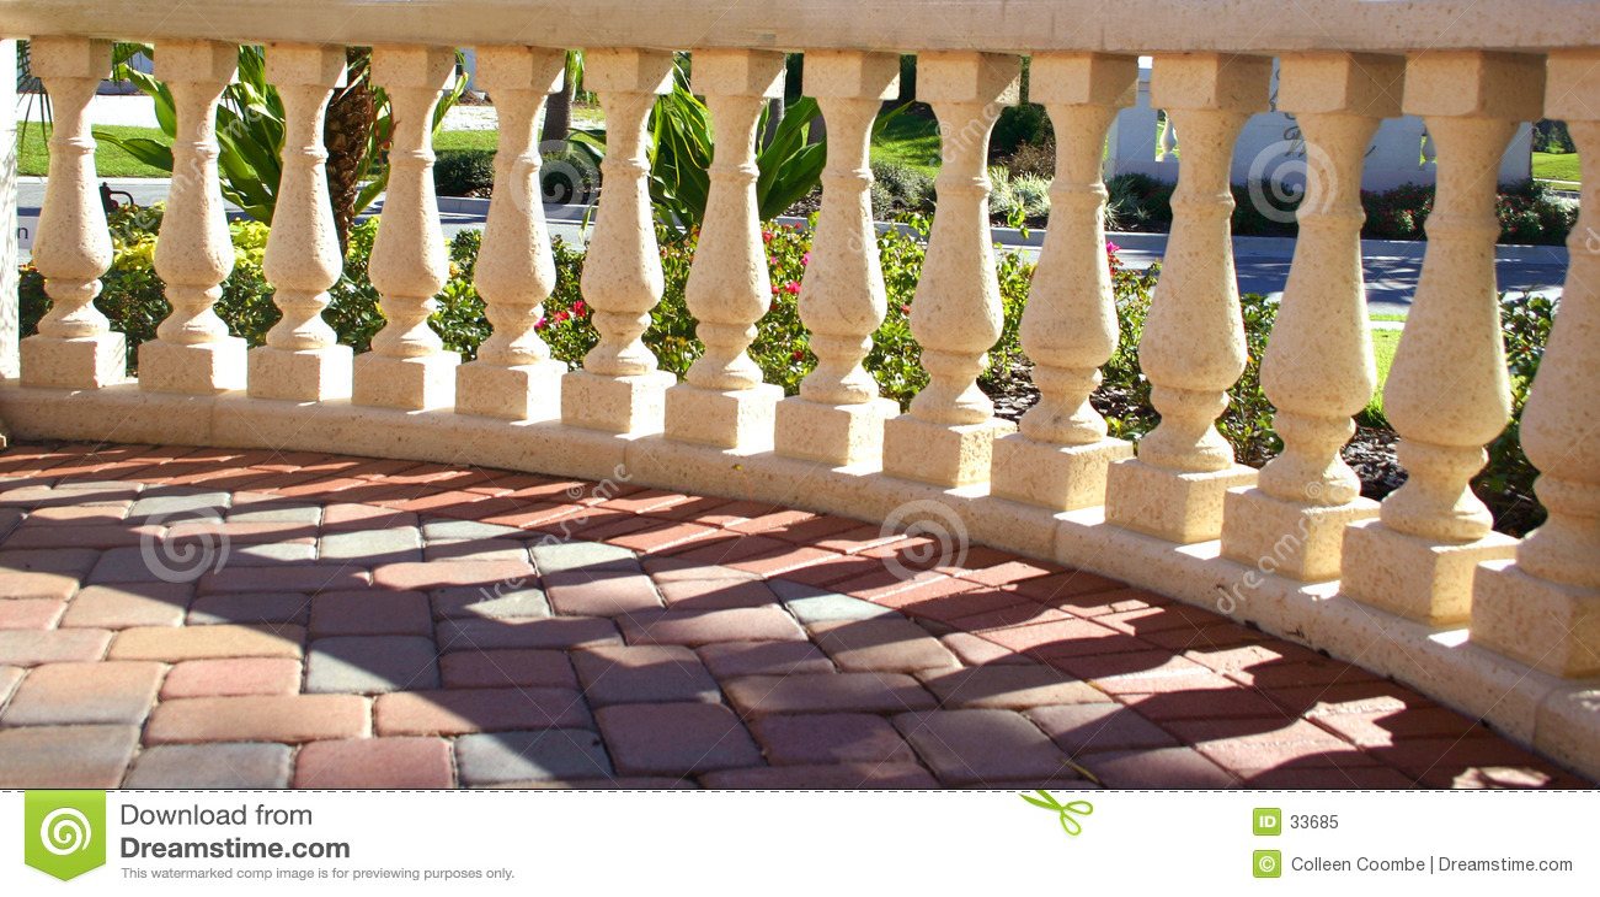 Columns in Sunshine & Shadows